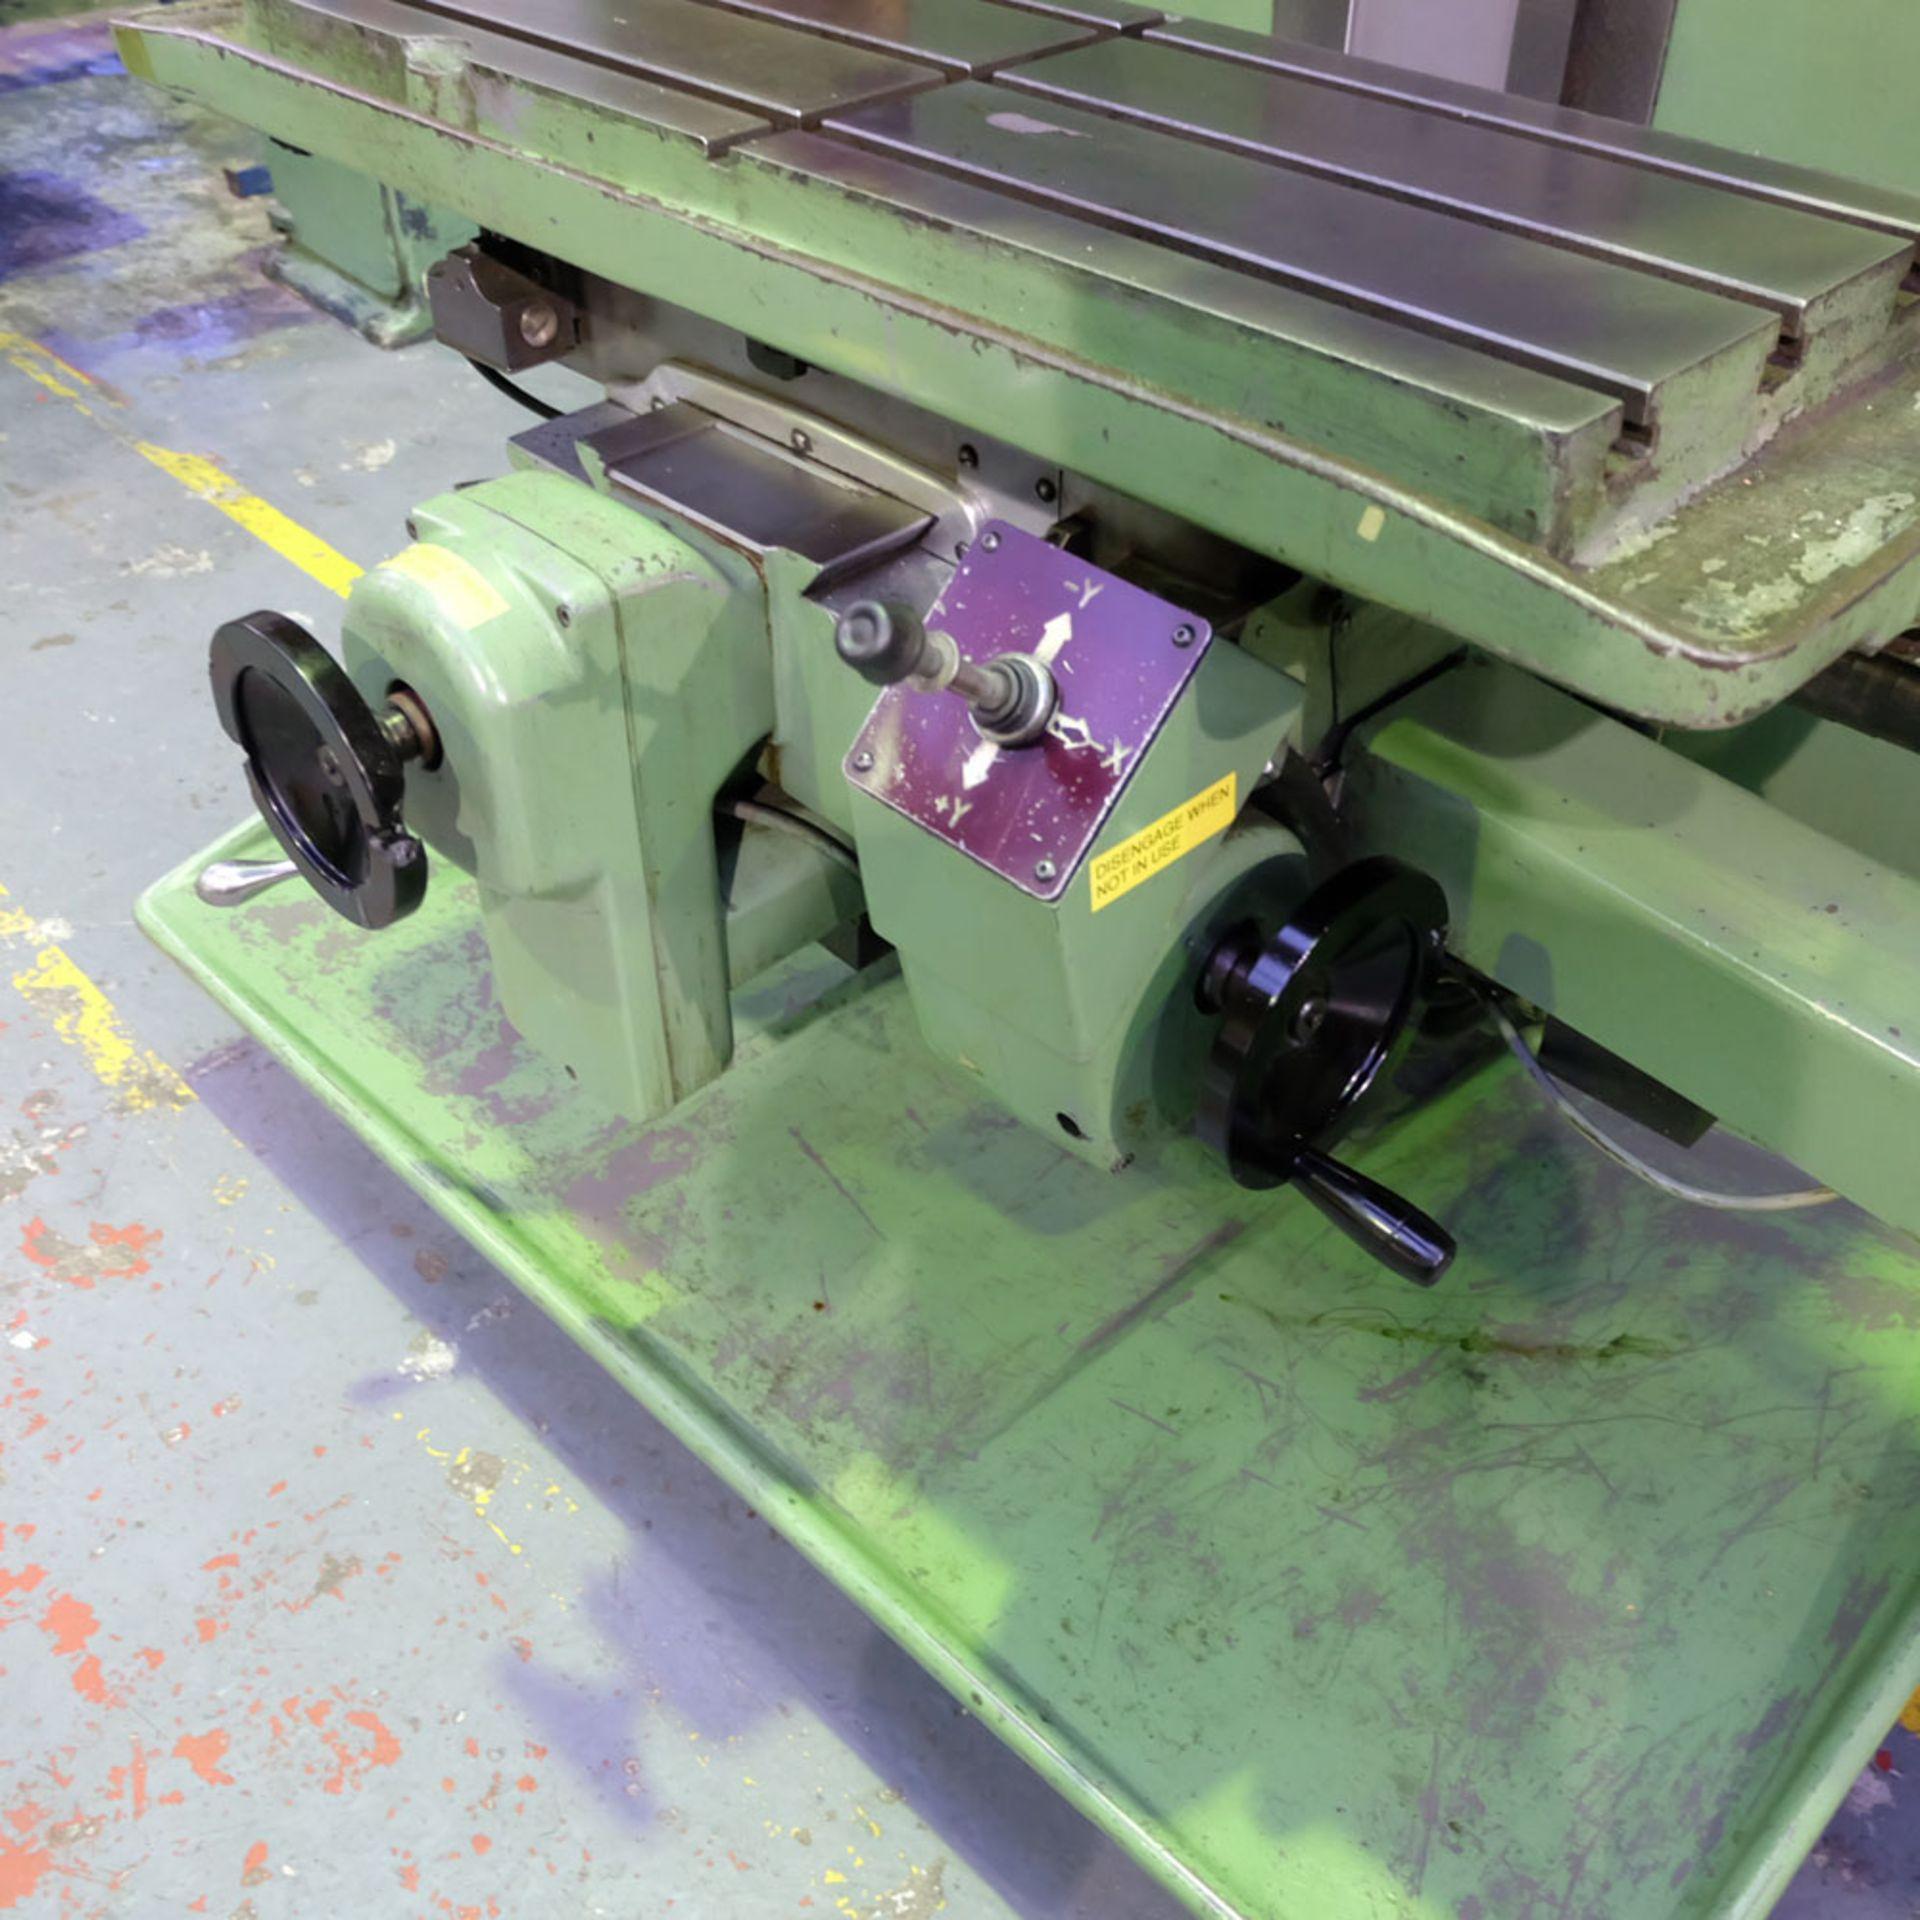 Bridgeport Series 1 MDI. CNC Mill with Heidenhain TNC131 3 Axis Control. - Image 7 of 14